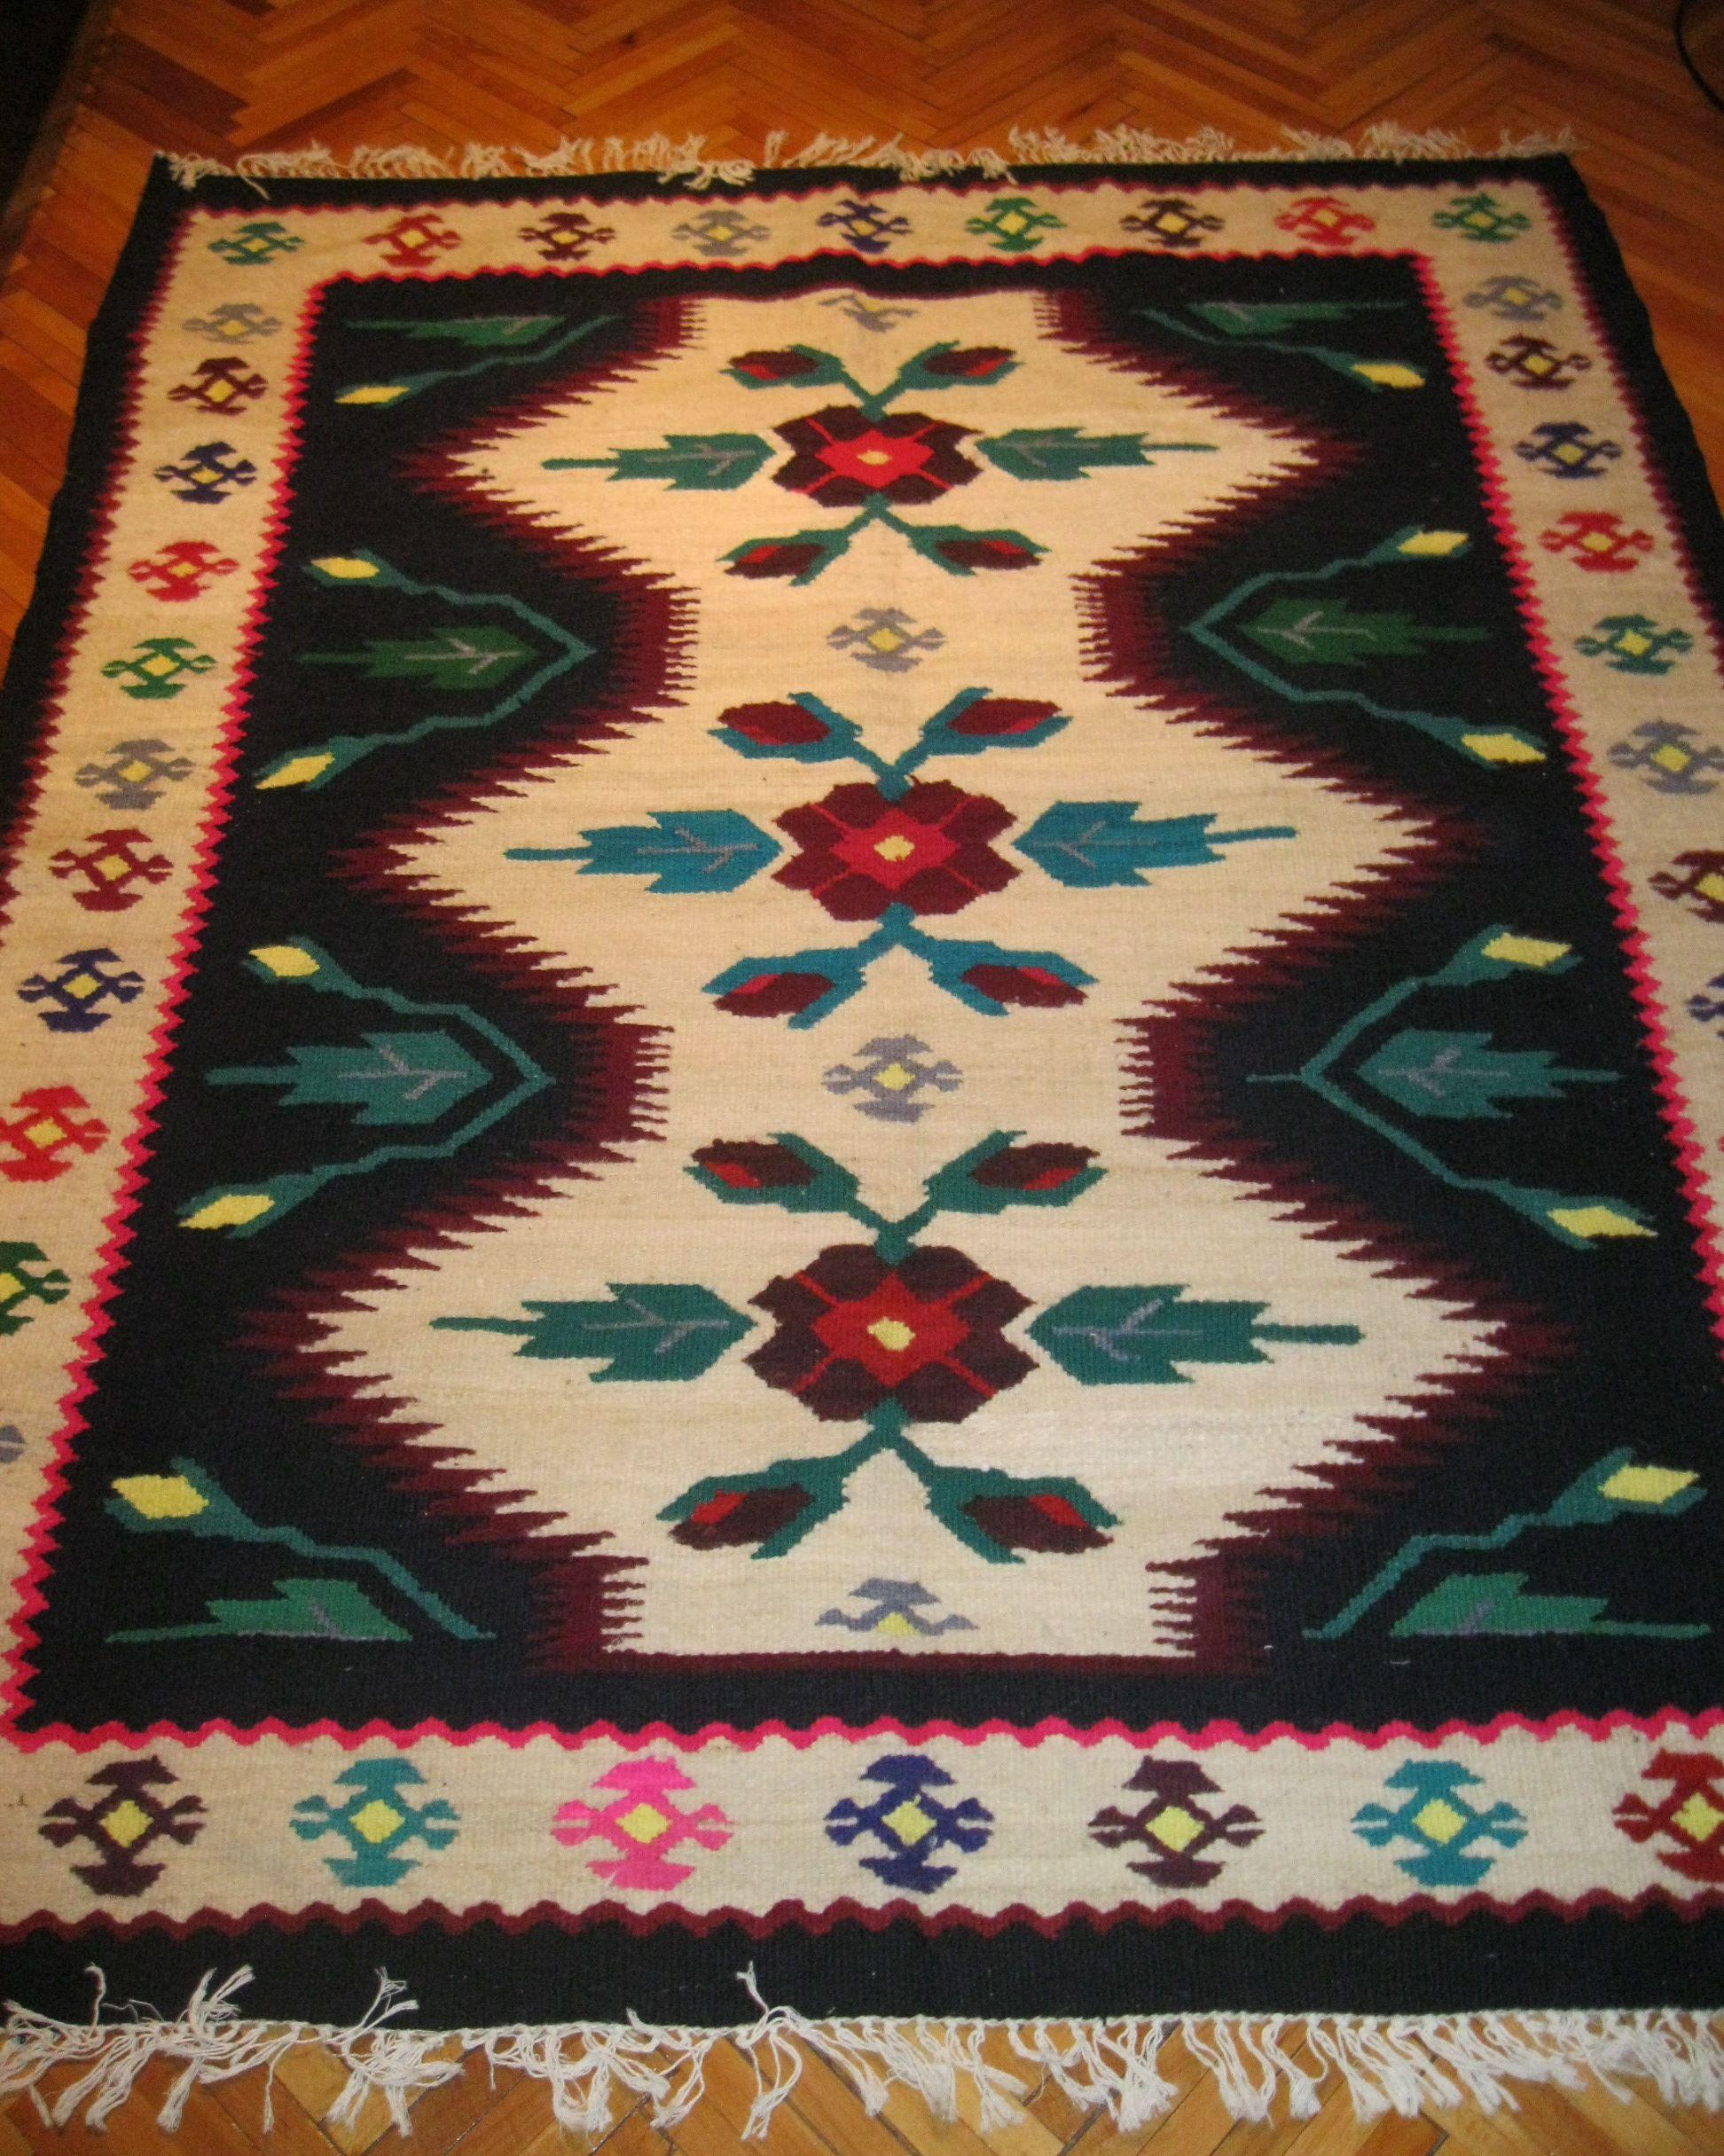 Antique Hand Woven Romanian Carpet Rug